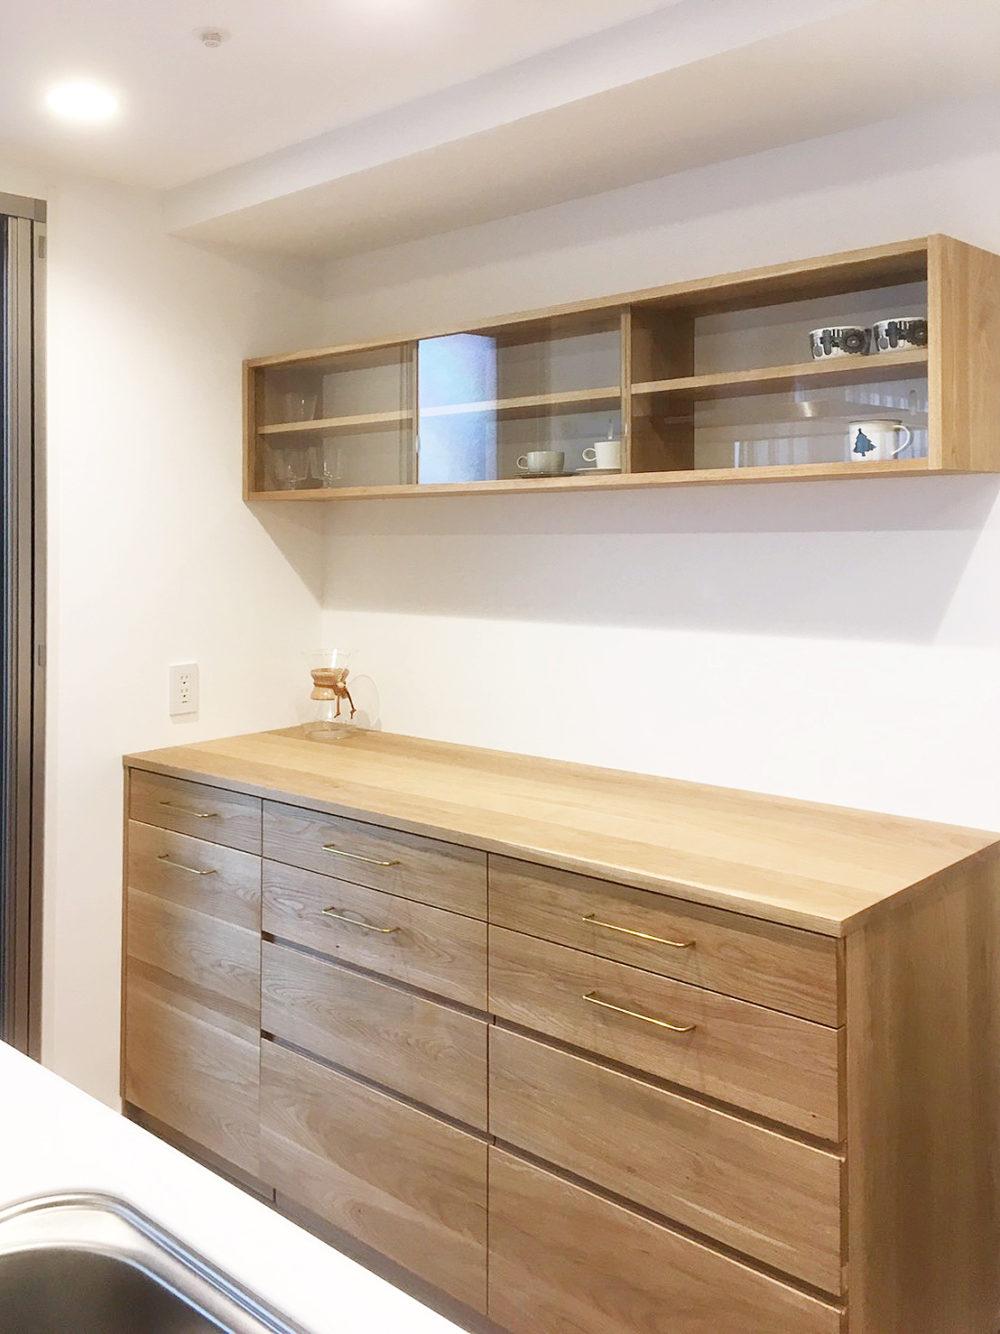 オーダー家具・食器棚 /兵庫県・尼崎